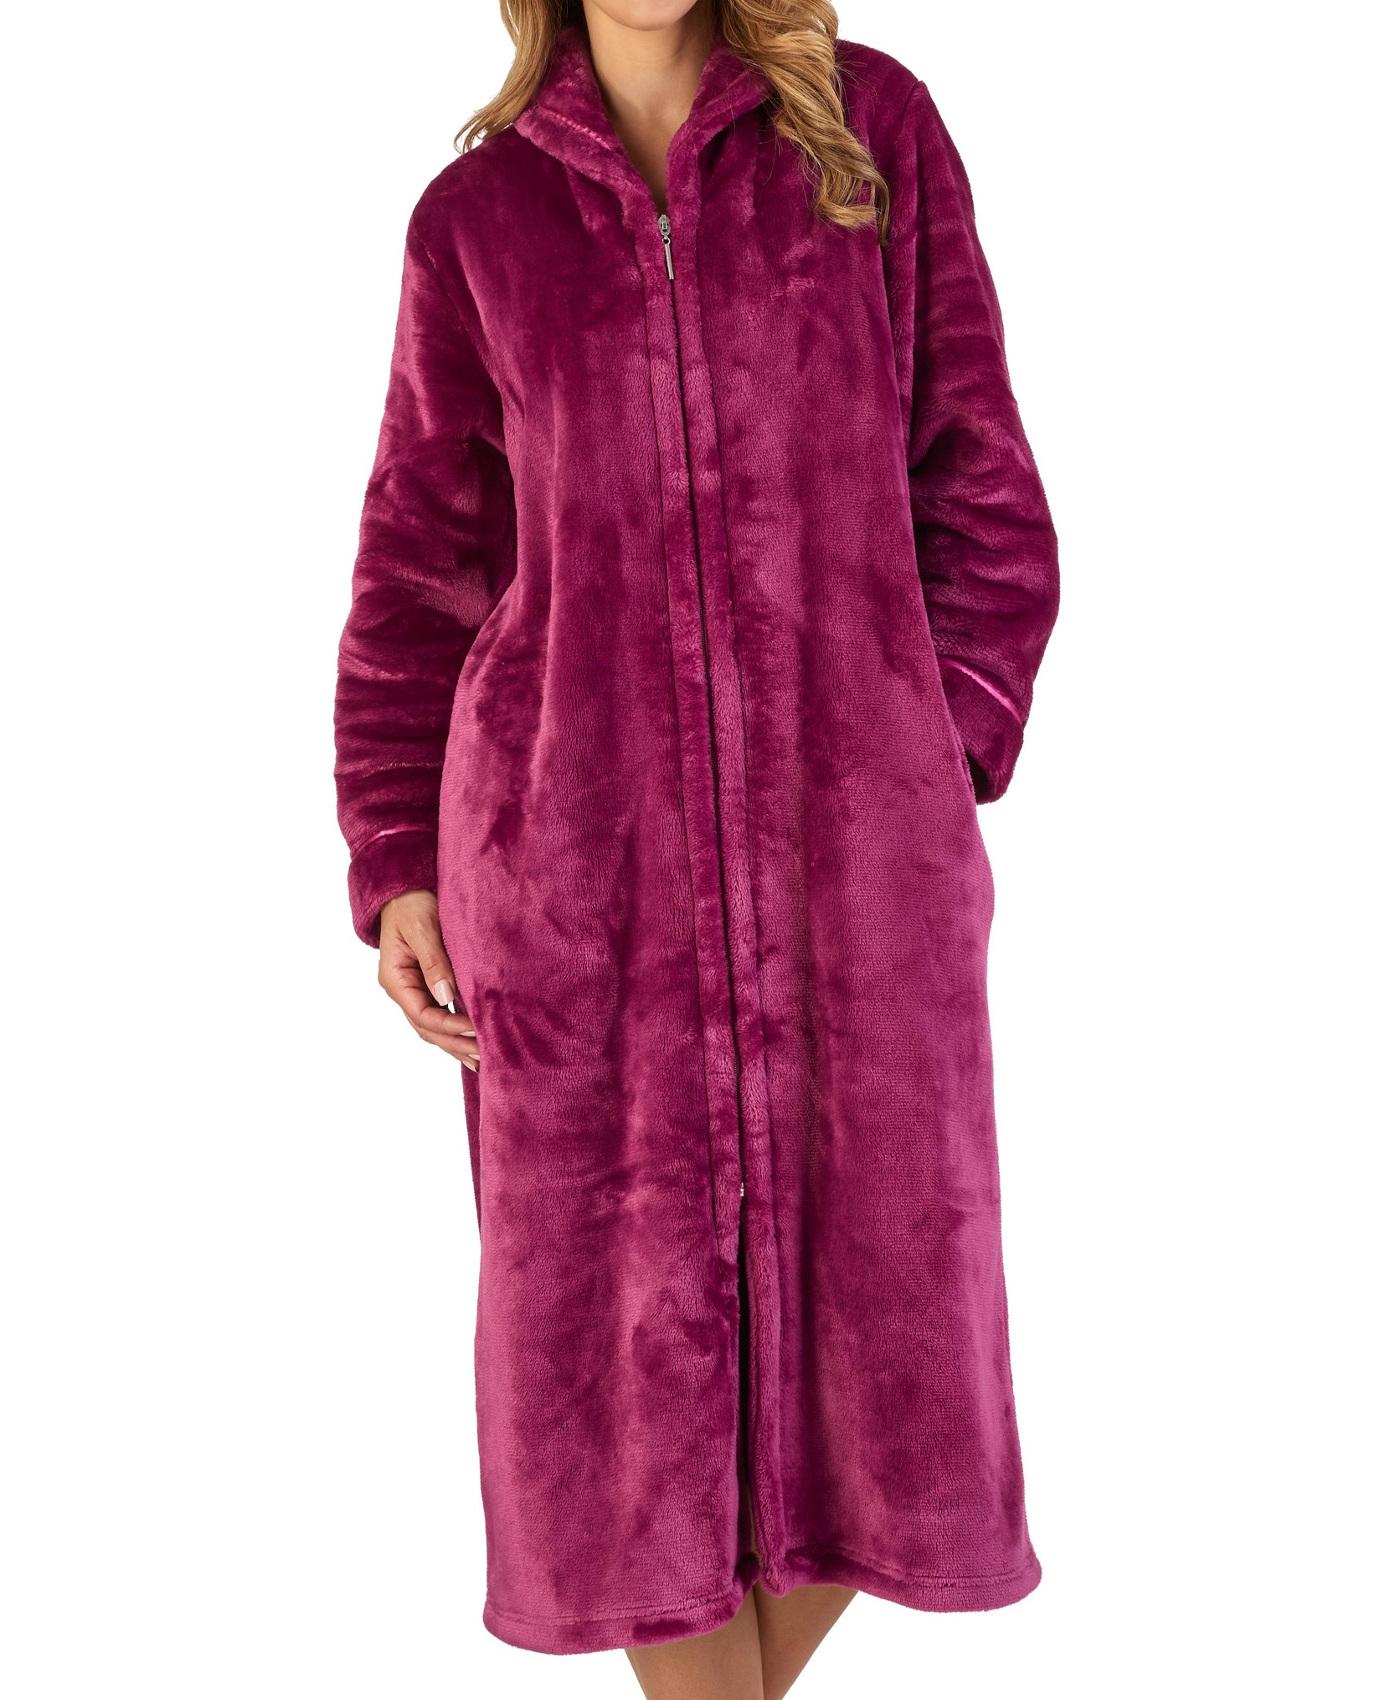 Slenderella Womens Luxury Thick Flannel Fleece Dressing Gown Zip Up ... 5efc31a0a